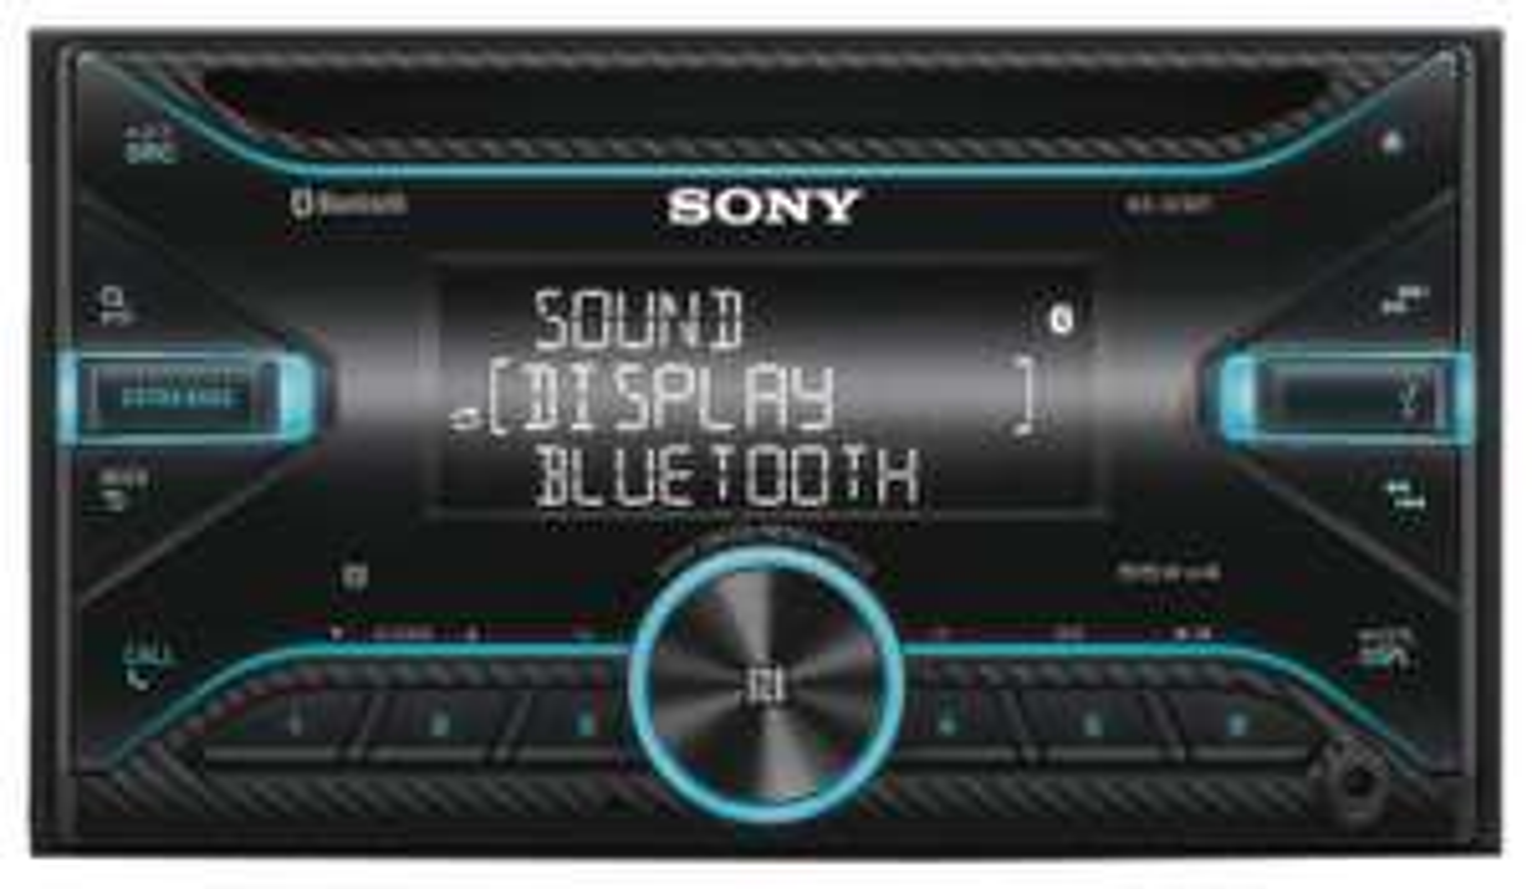 Sony WX920BT Car Stereo with Bluetooth £82.99 Argos